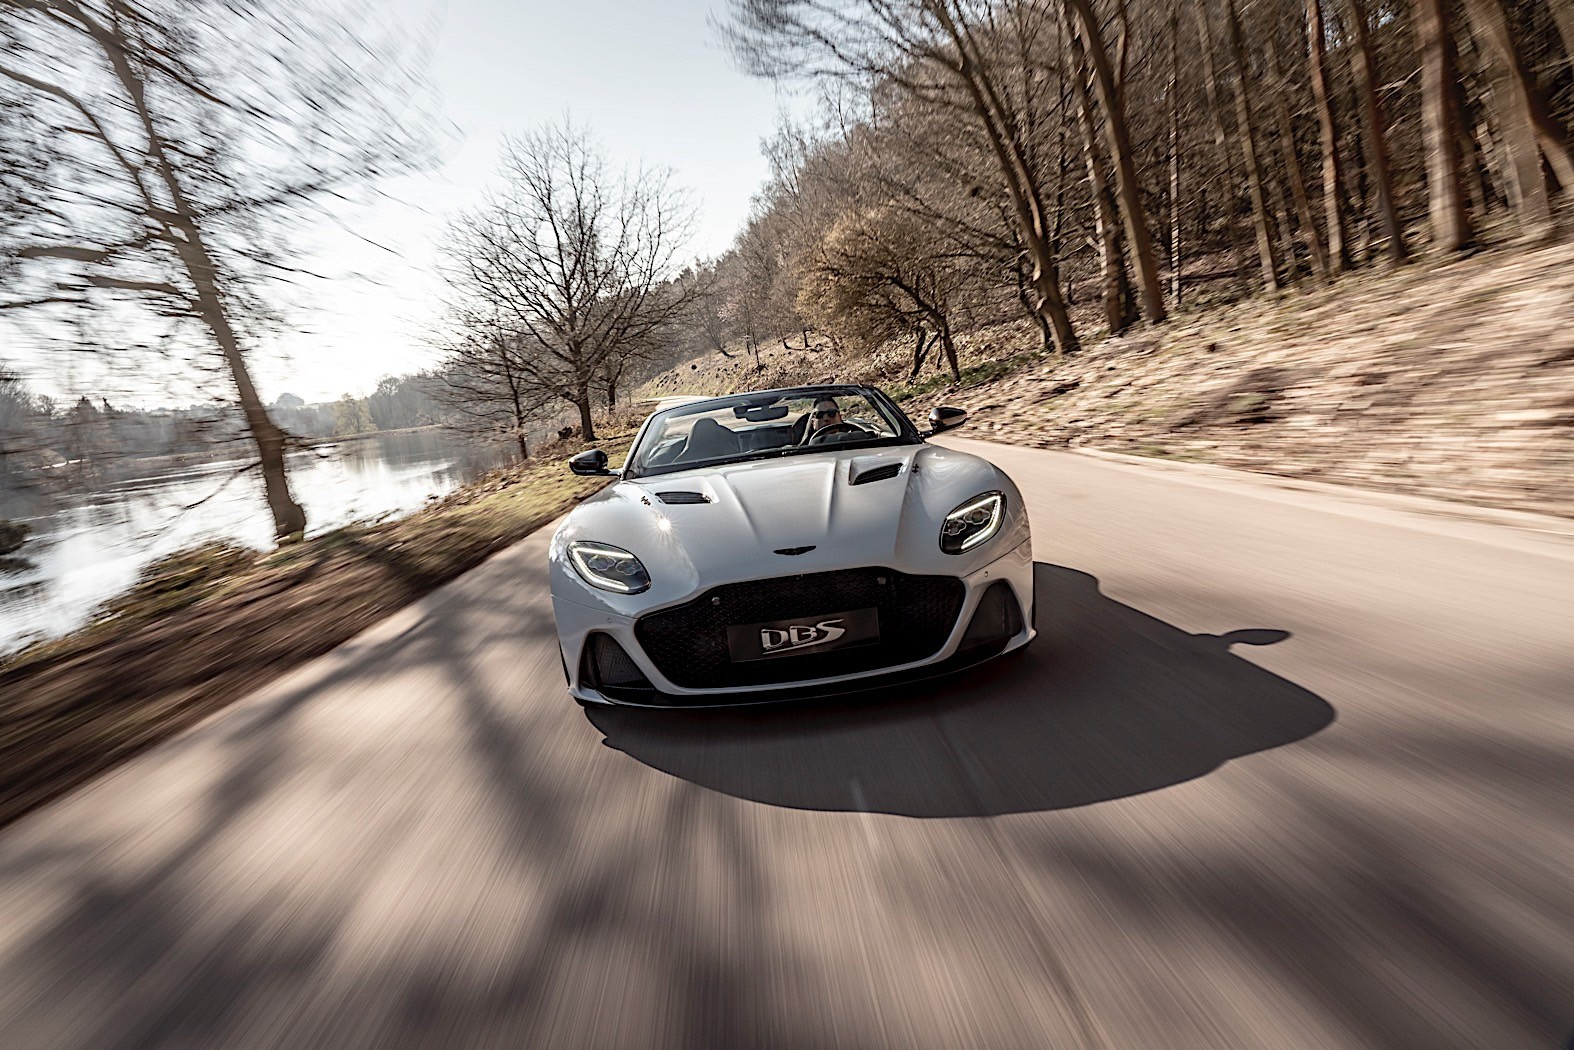 2020 Dbs Superleggera Volante Is The Fastest Aston Martin Convertible Ever Autoevolution